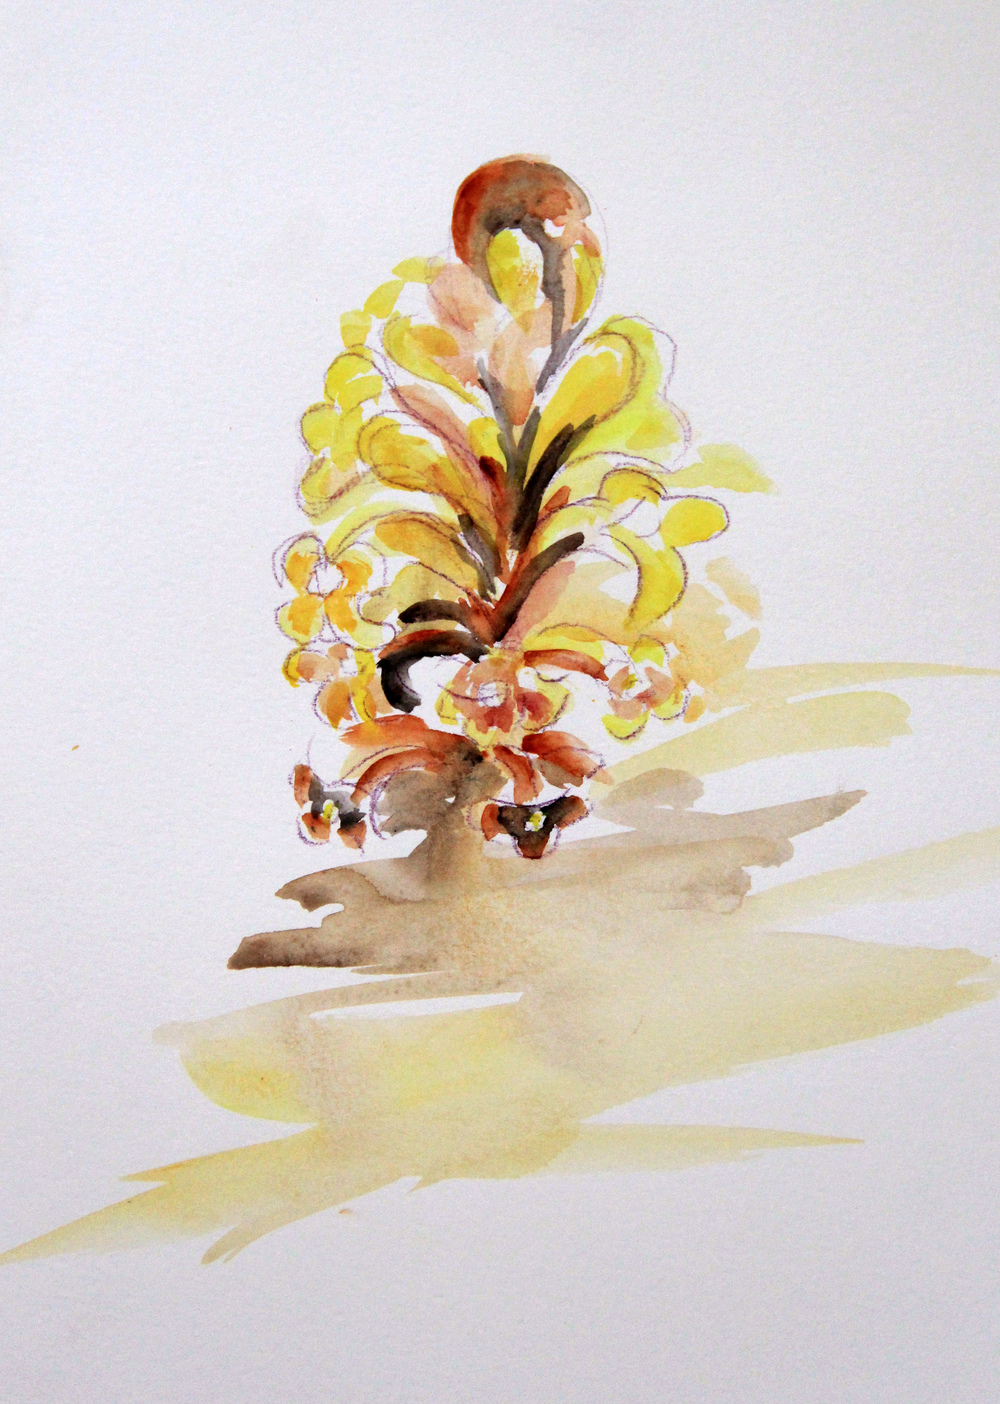 Mangroves_From_The_Water_77_Zahidah_Zeytoun_Showcase.jpg.jpg